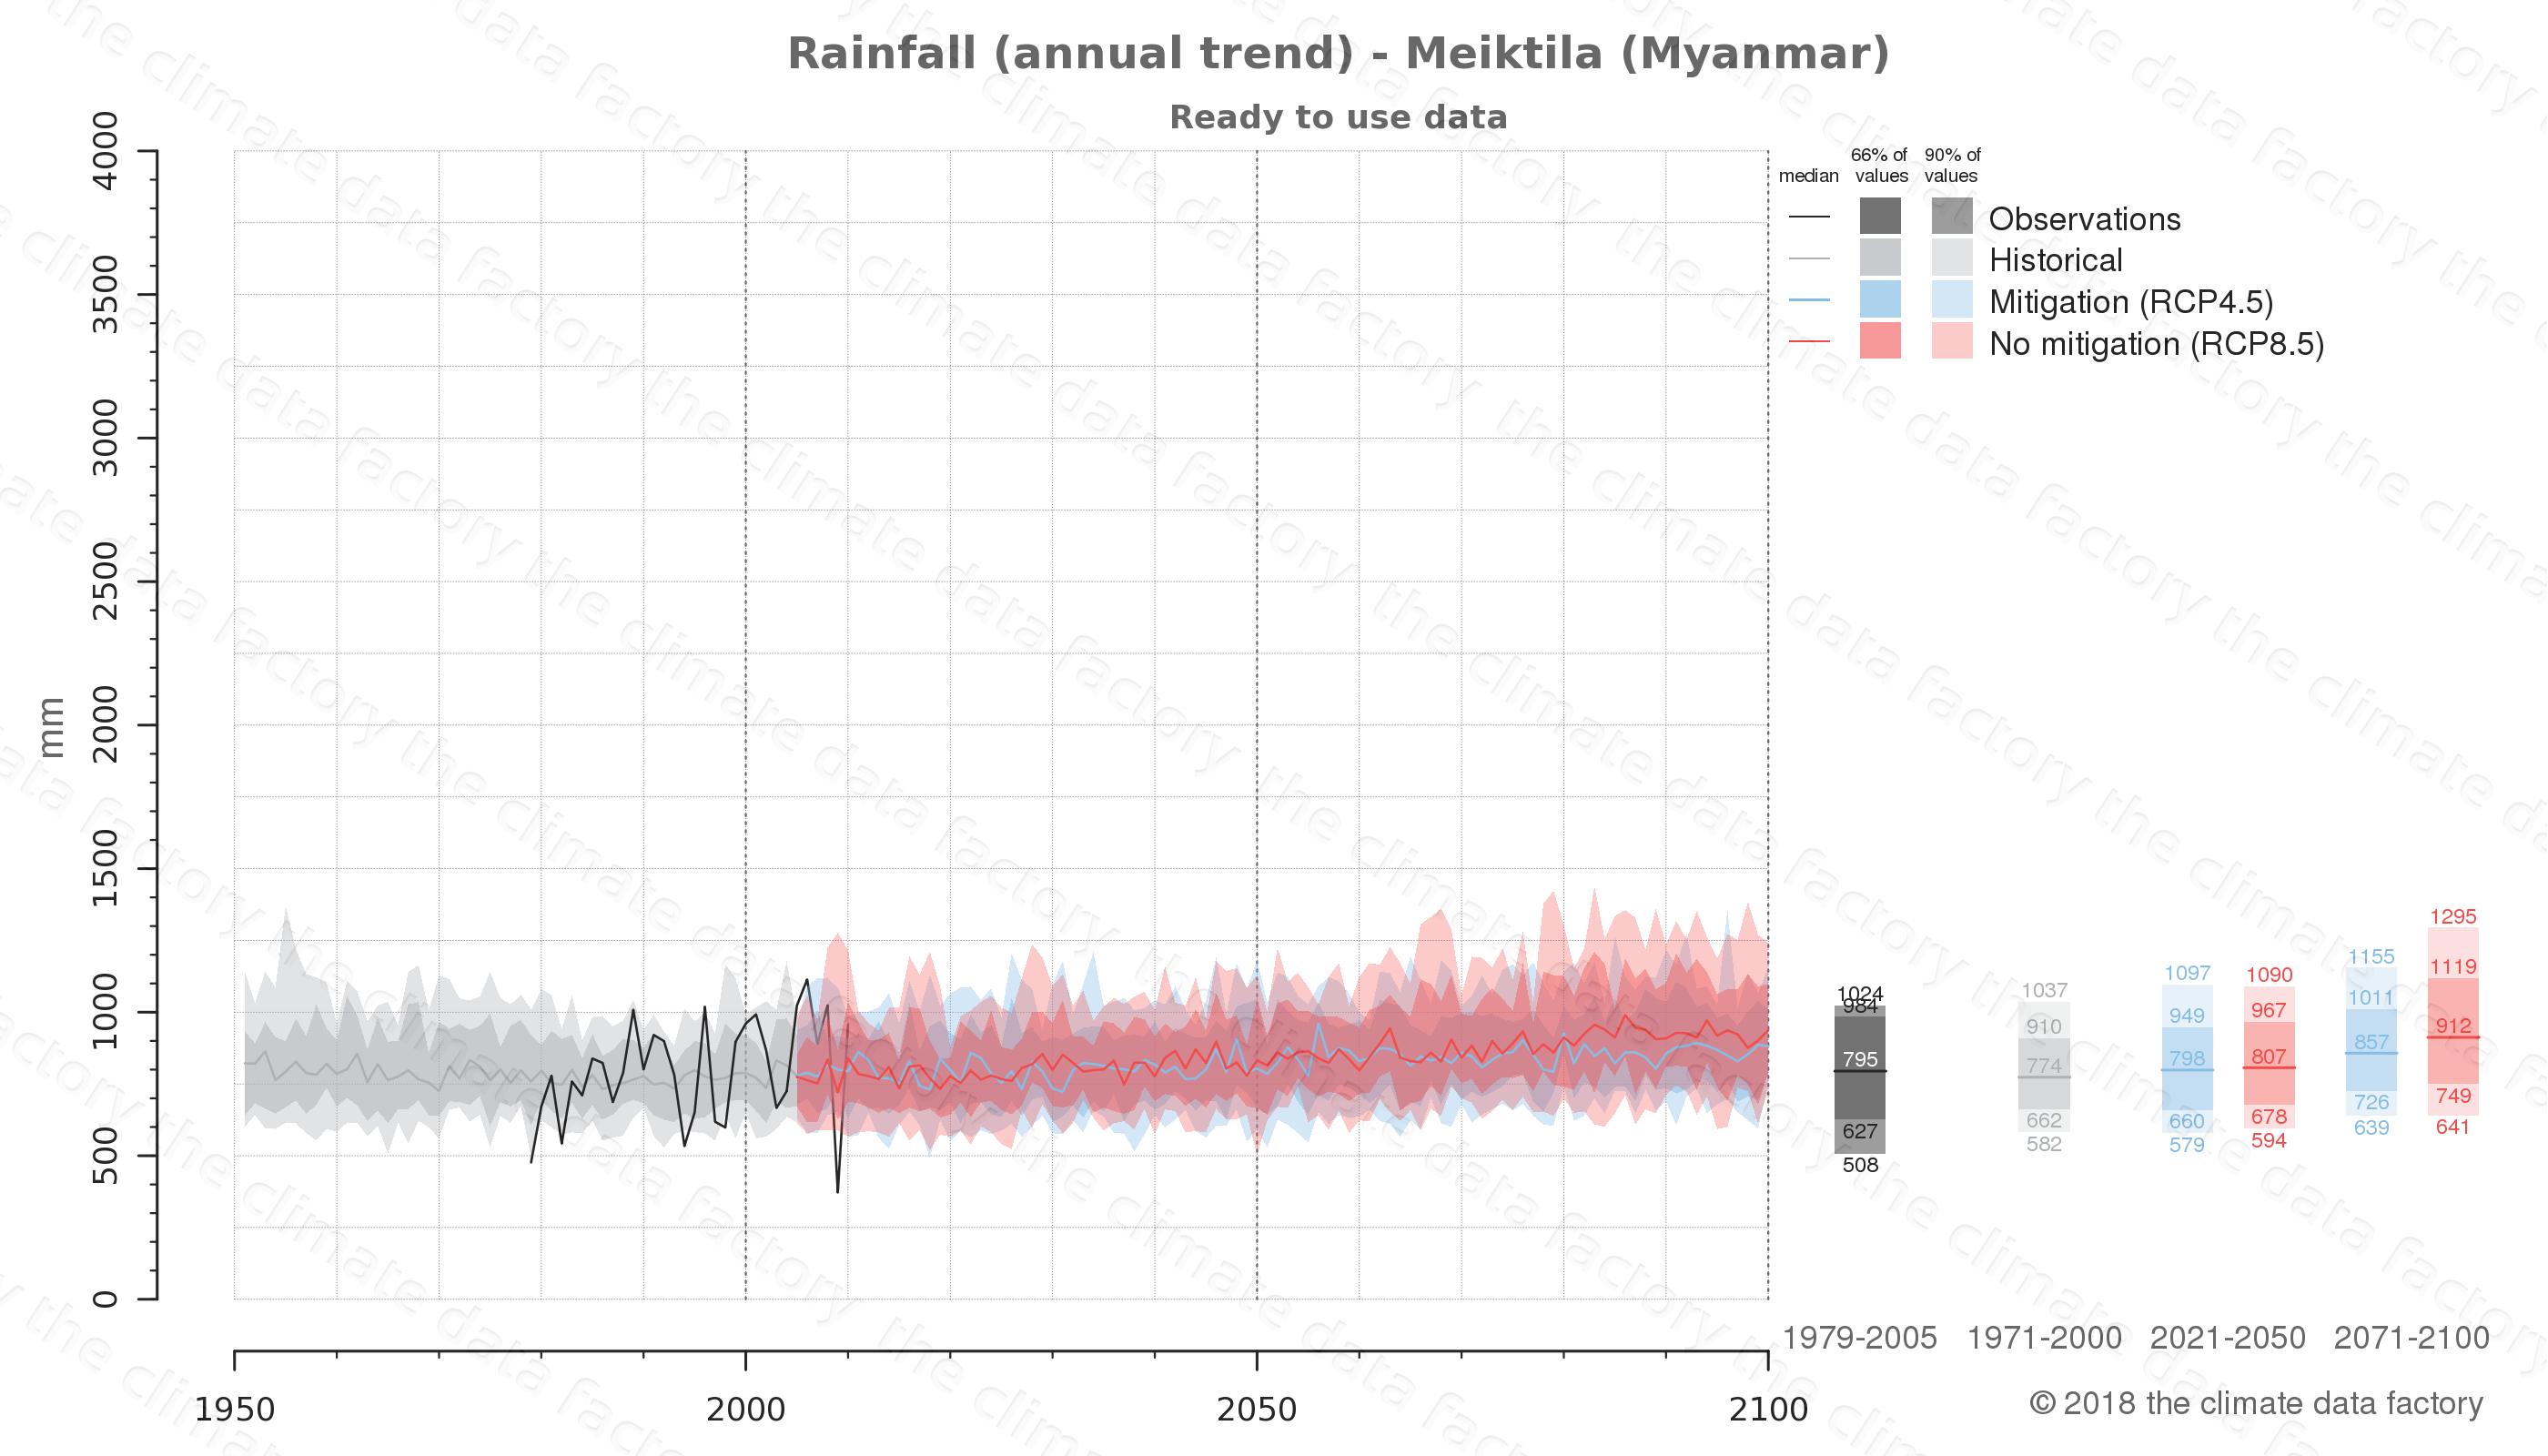 climate change data policy adaptation climate graph city data rainfall meiktila myanmar